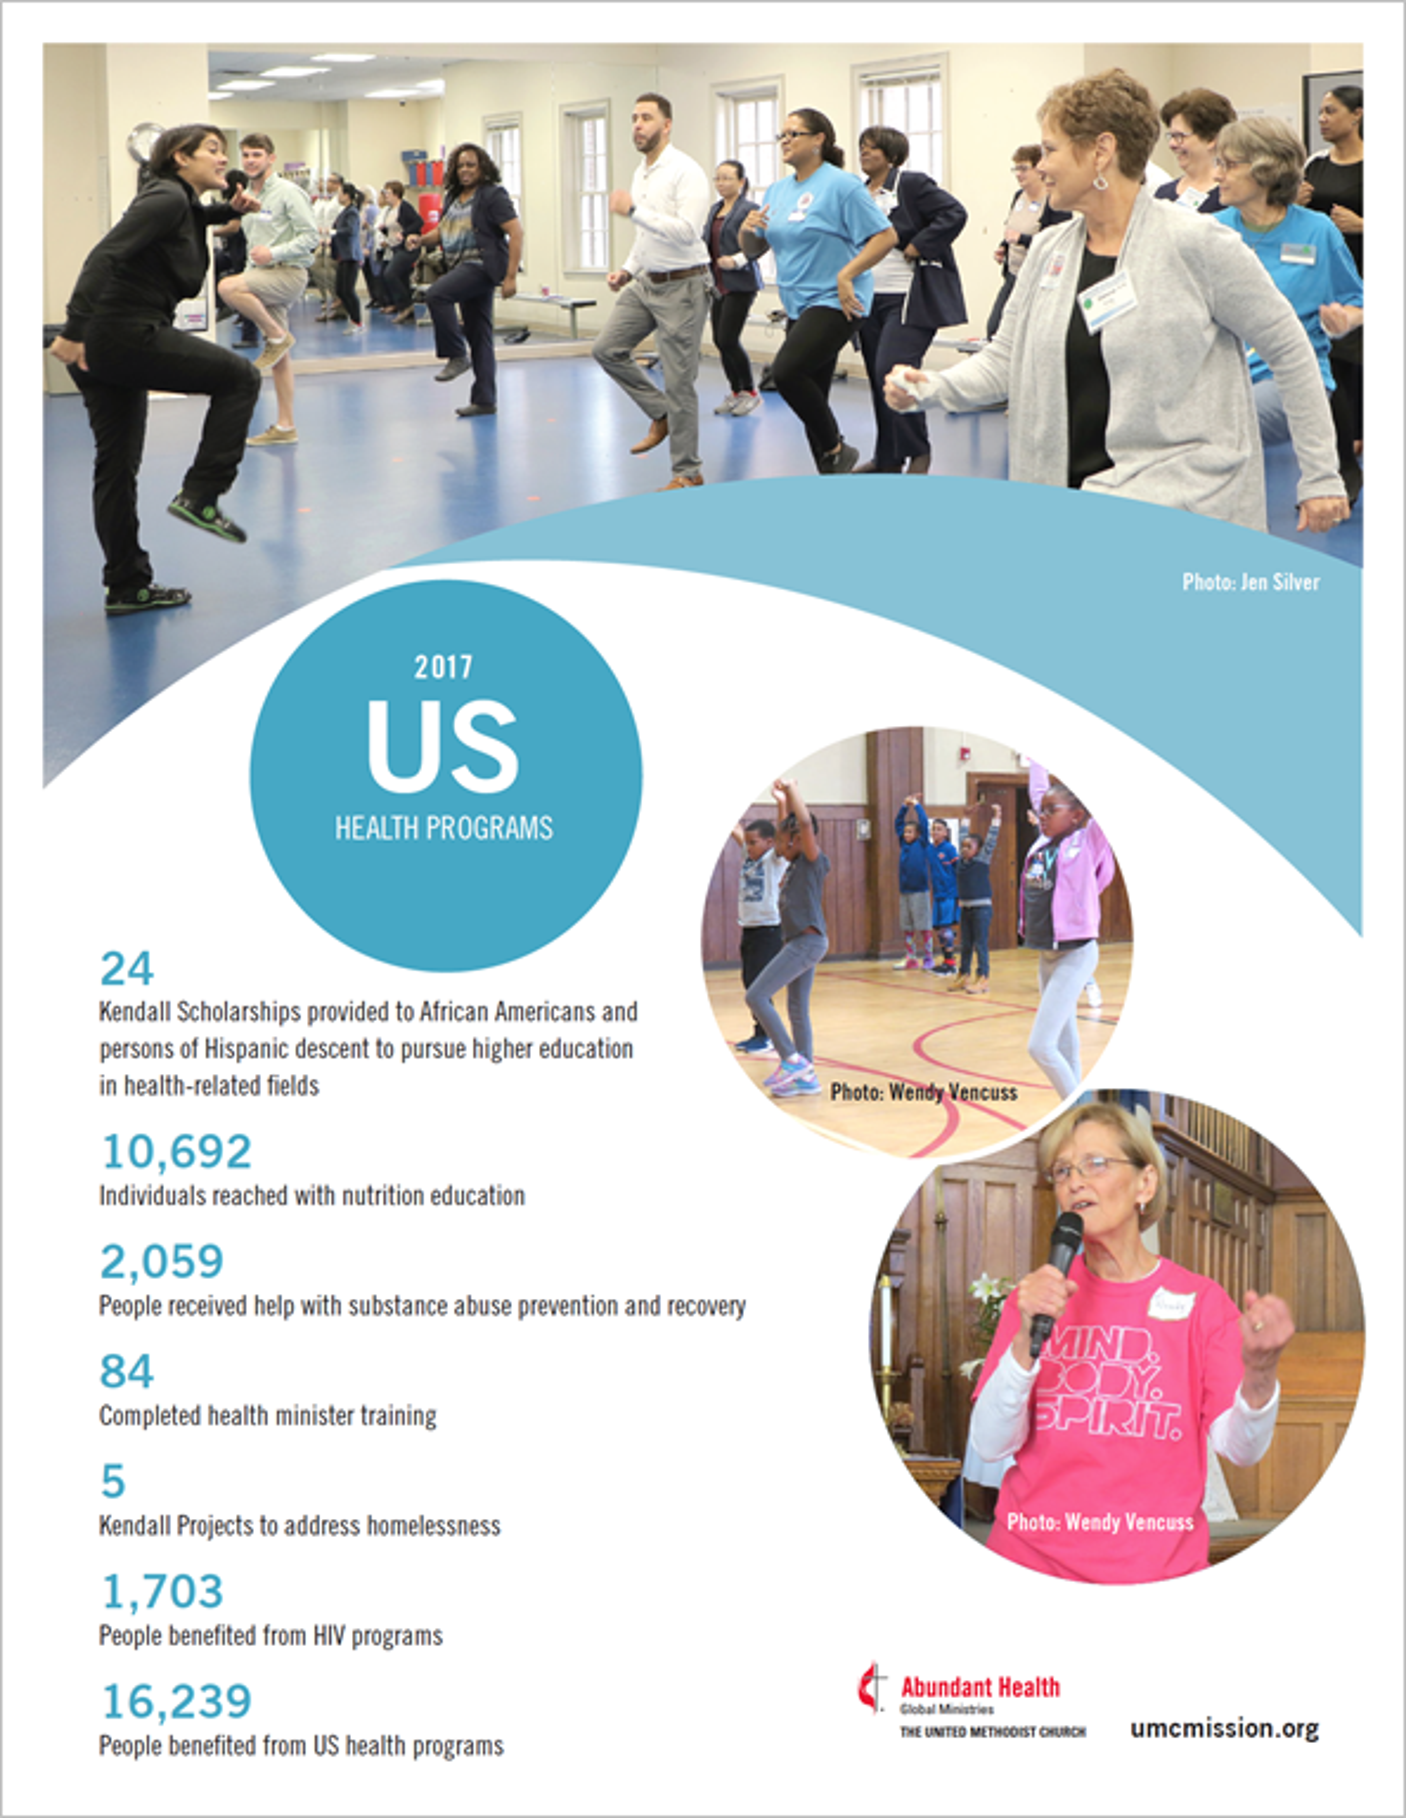 US Health Programs